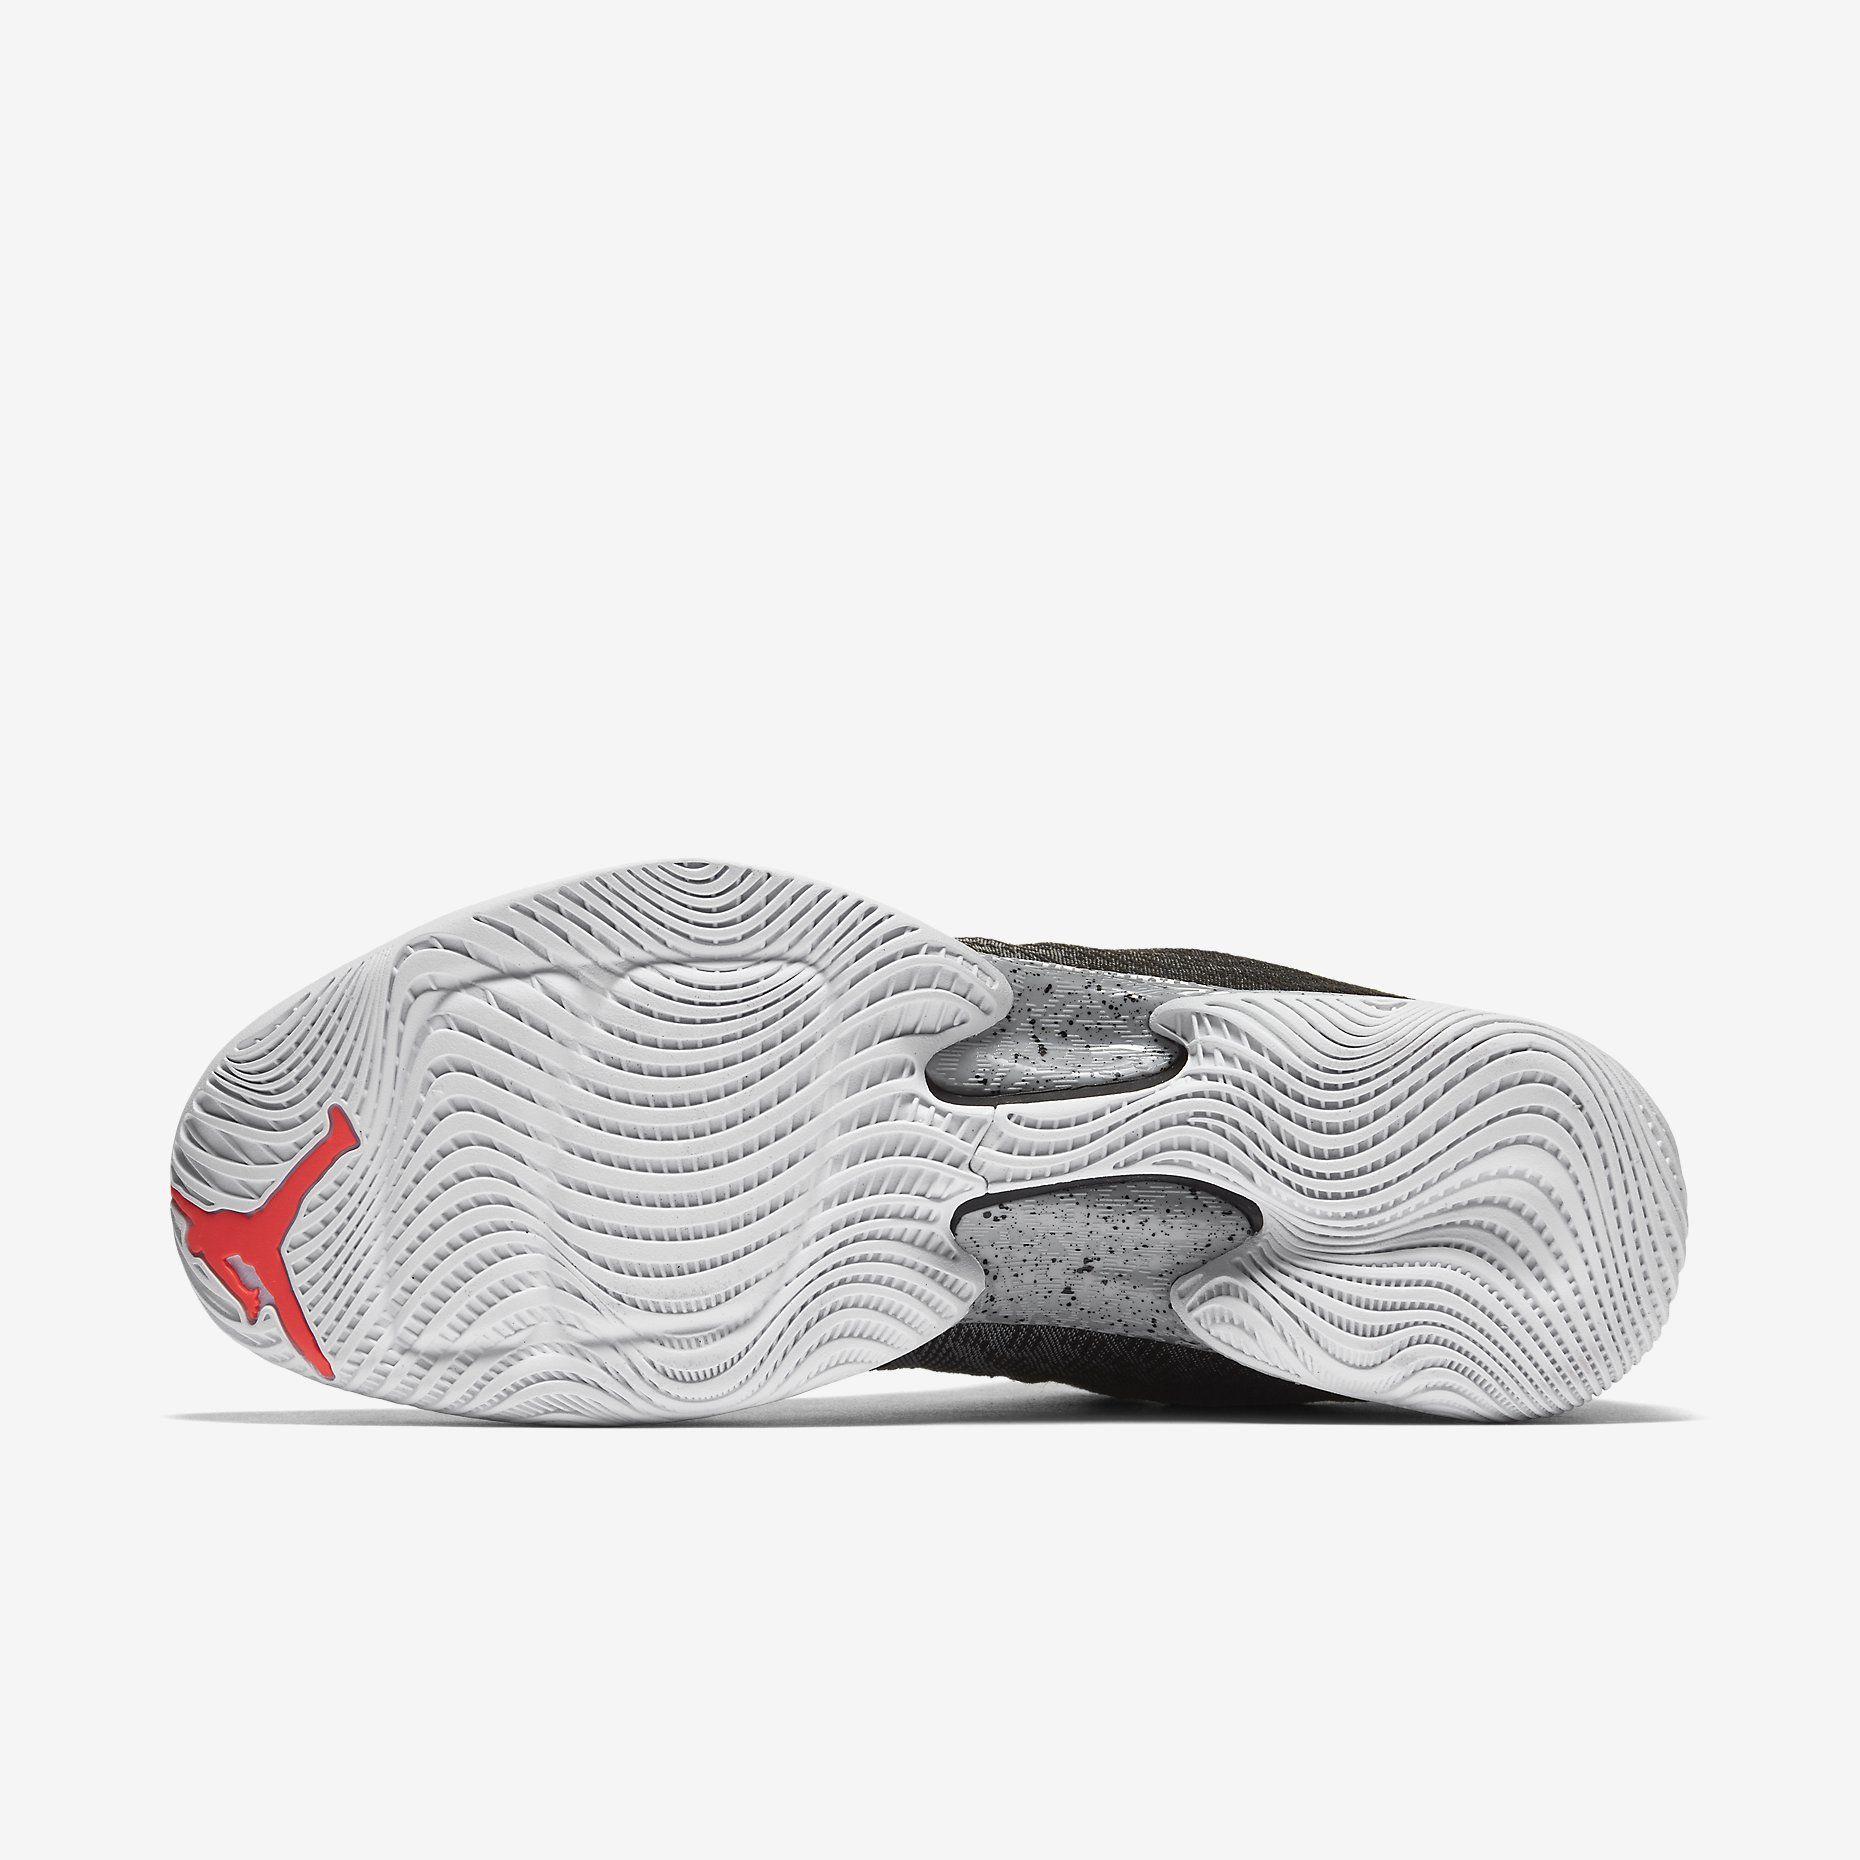 new product 8c180 2dbde Air Jordan XX9 Low (Black Wolf Grey White Infrared 23)